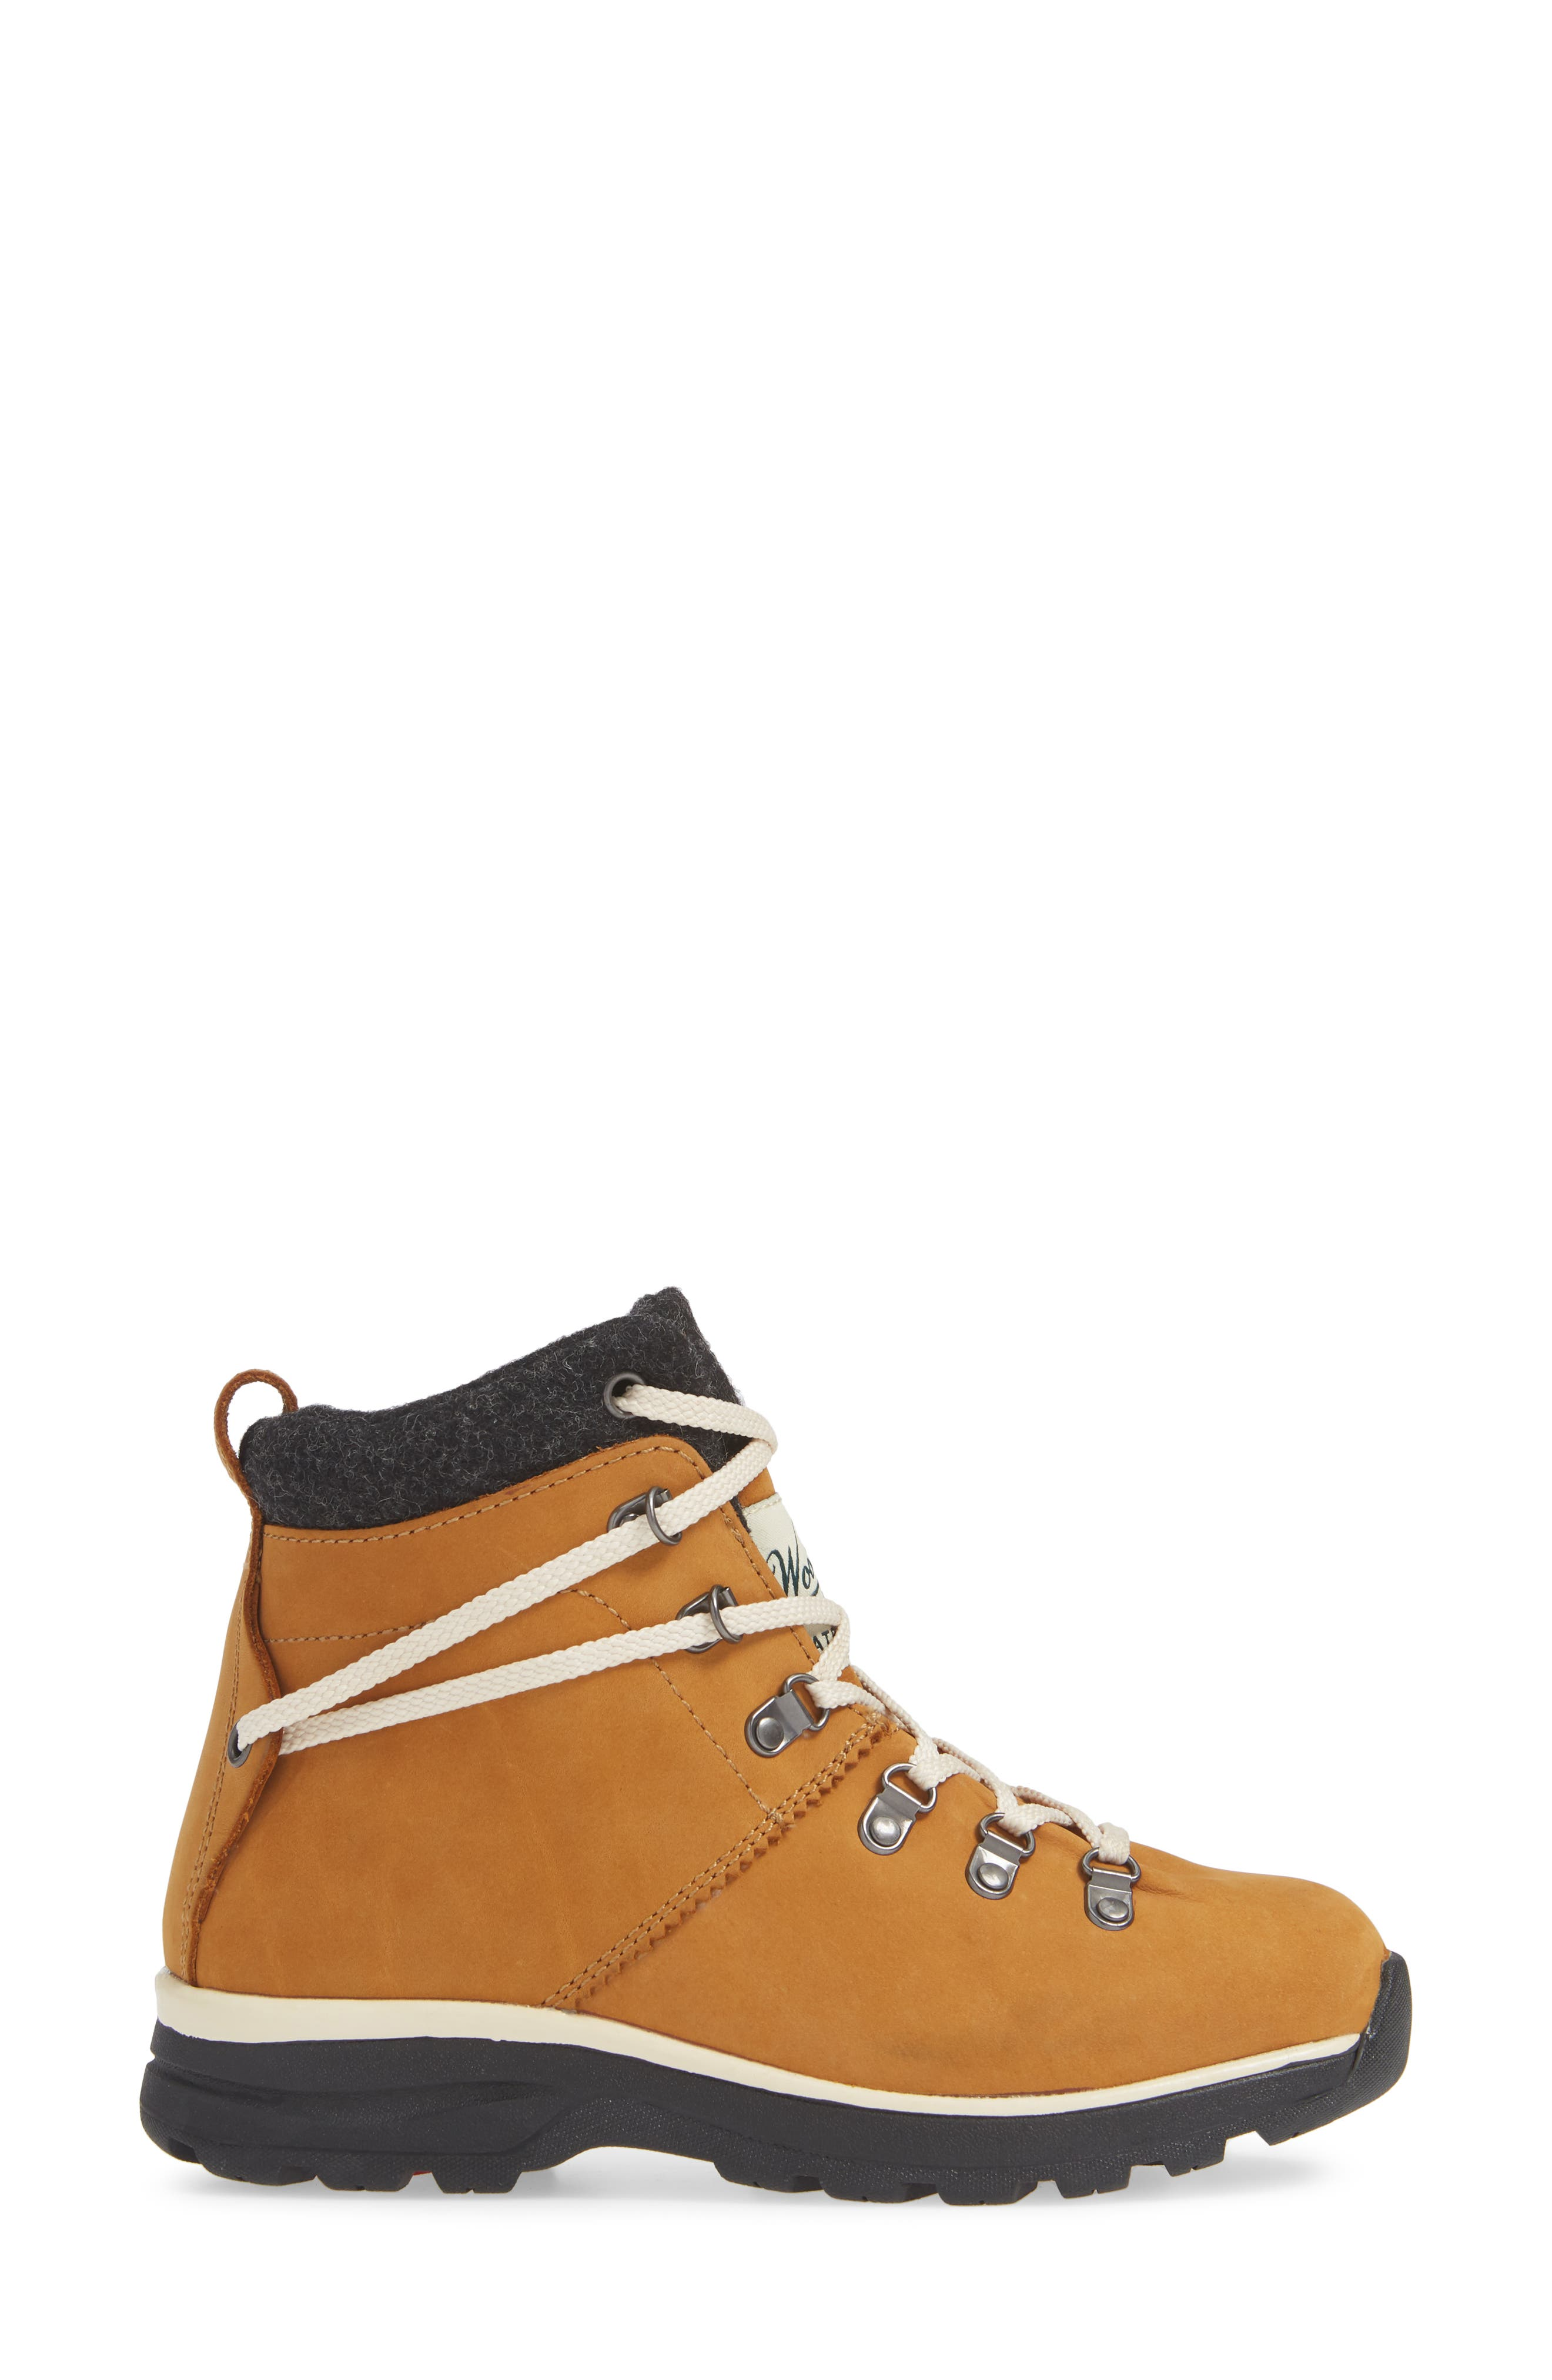 Rockies II Waterproof Hiking Boot,                             Alternate thumbnail 3, color,                             CONKER LEATHER